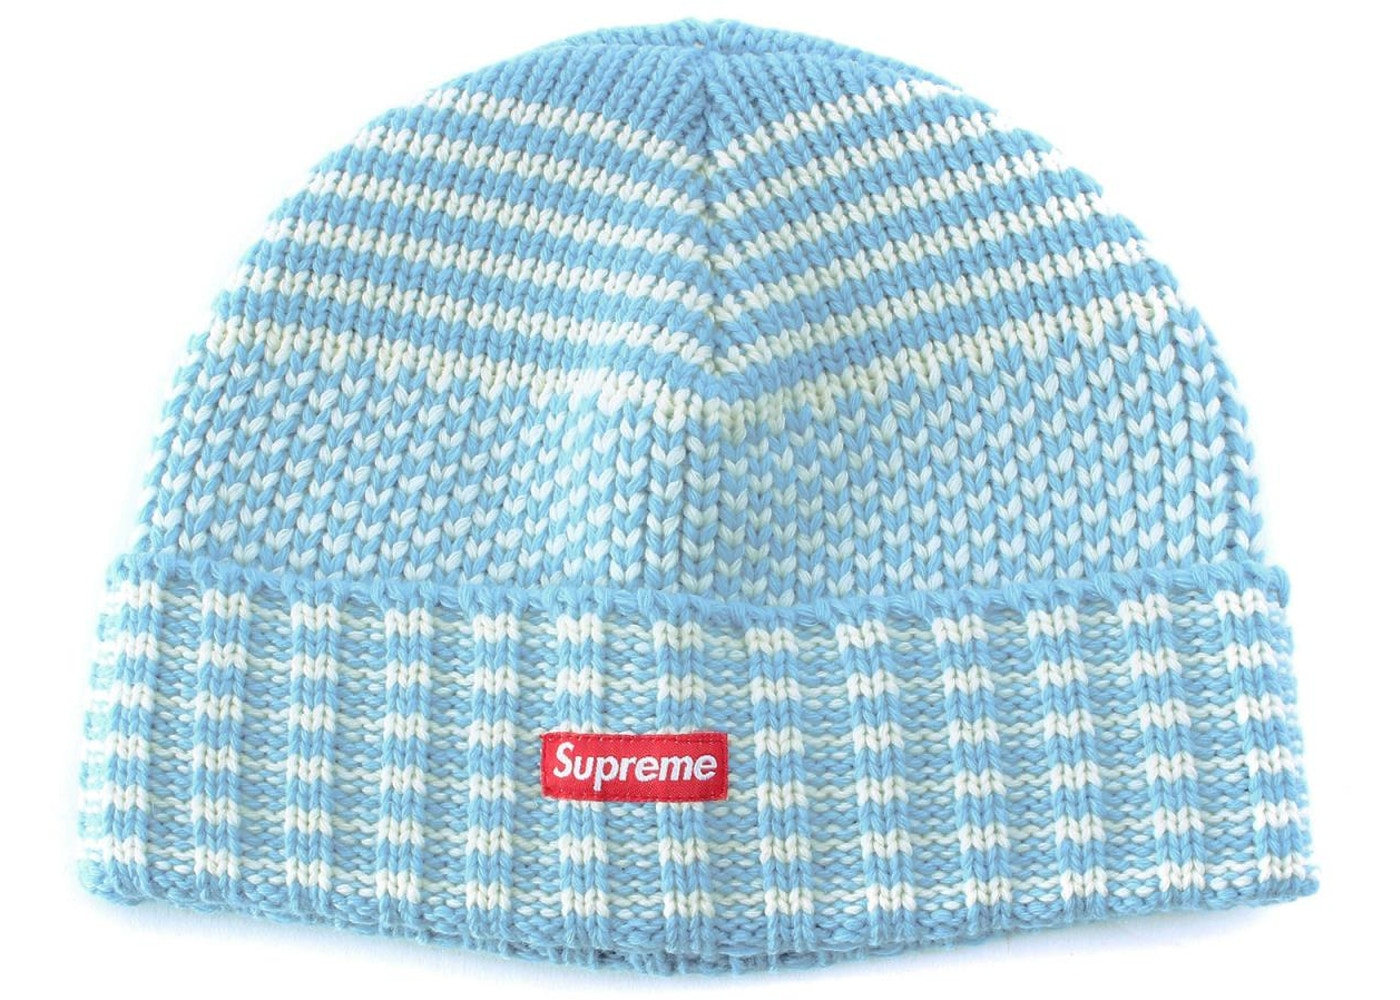 d4f23a4b9b1ce Supreme Headwear - Buy   Sell Streetwear